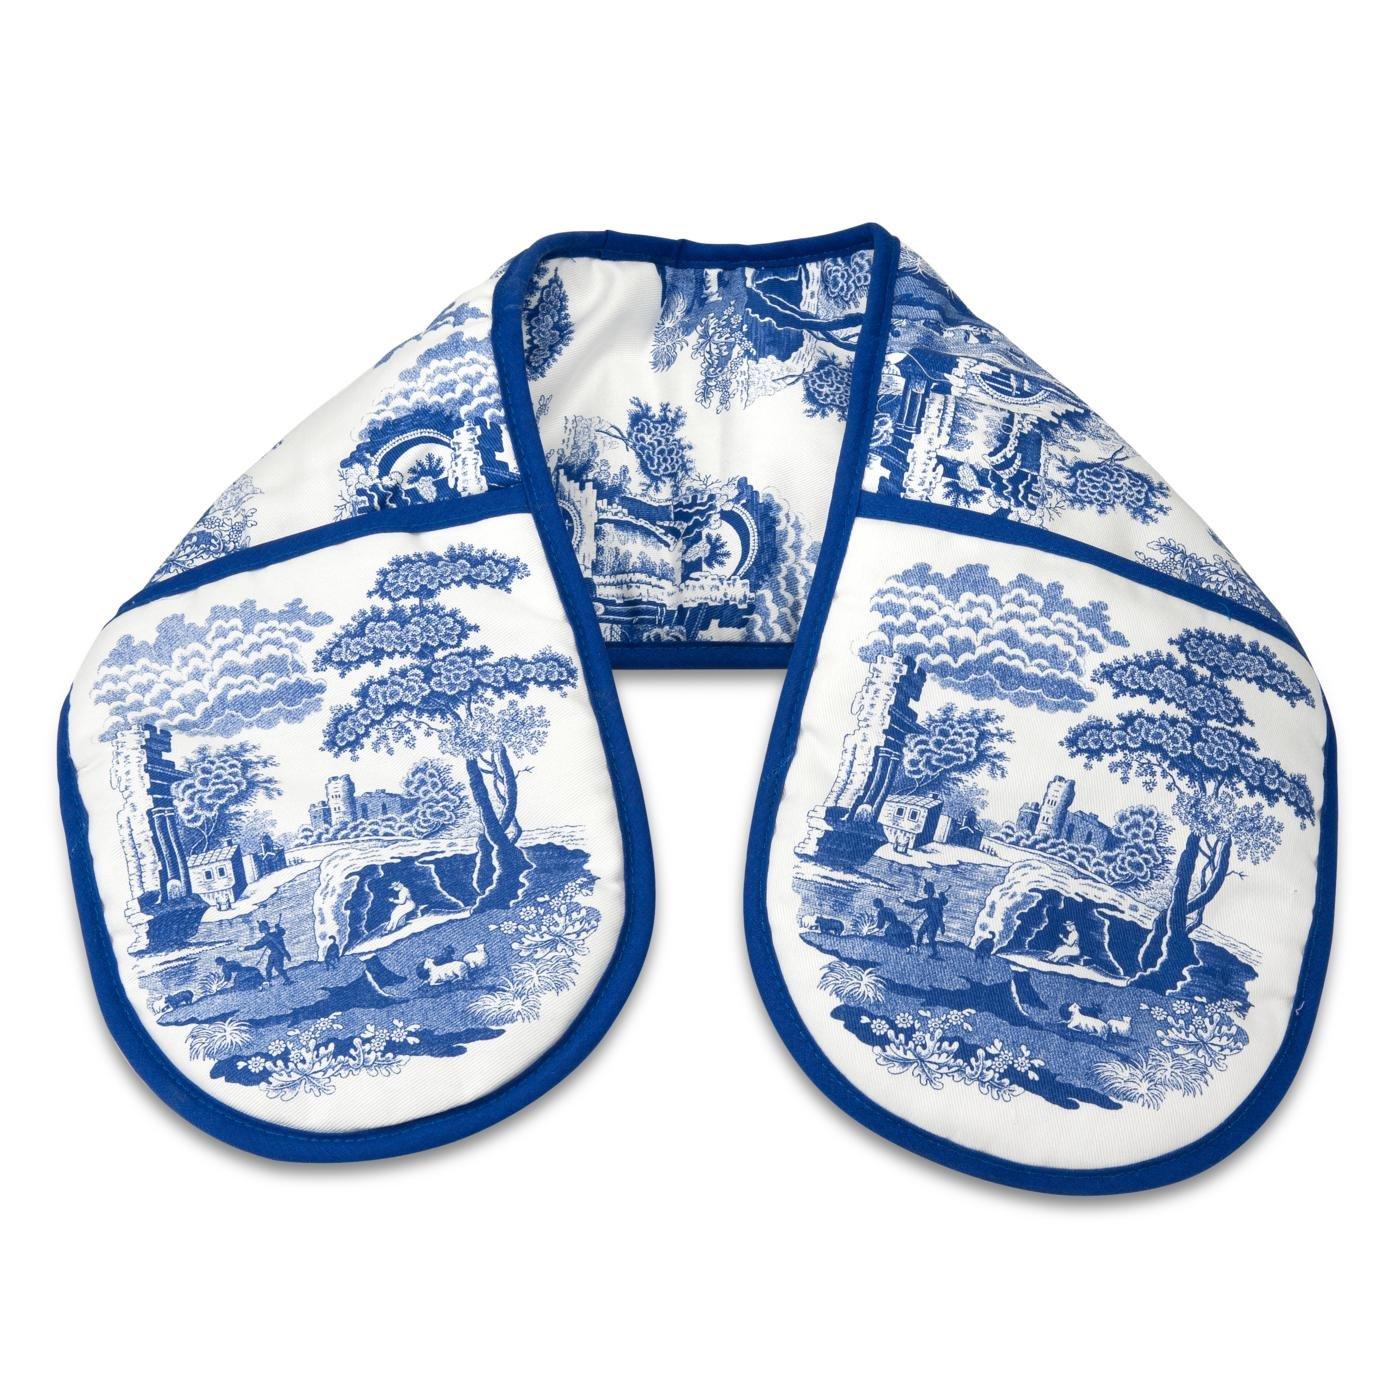 Spode - Blue Italian Double Oven Glove Portmeirion X0015038337